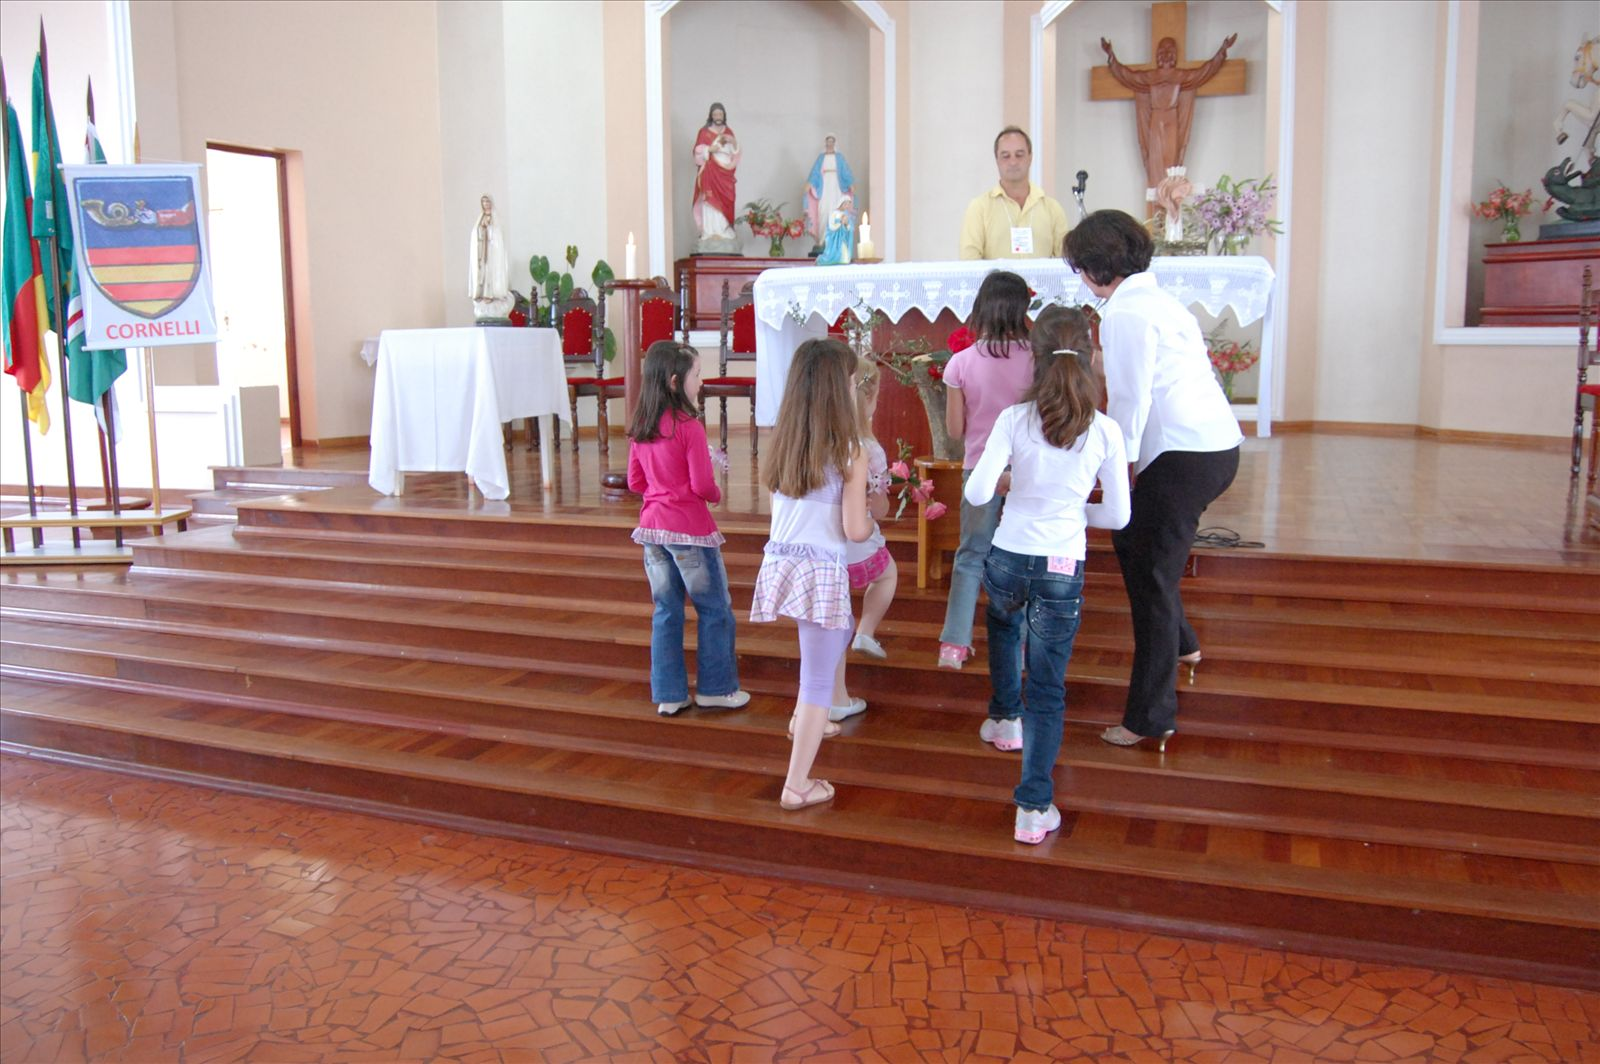 2º Encontro Família Cornelli - 11.10.2009 (131)_0